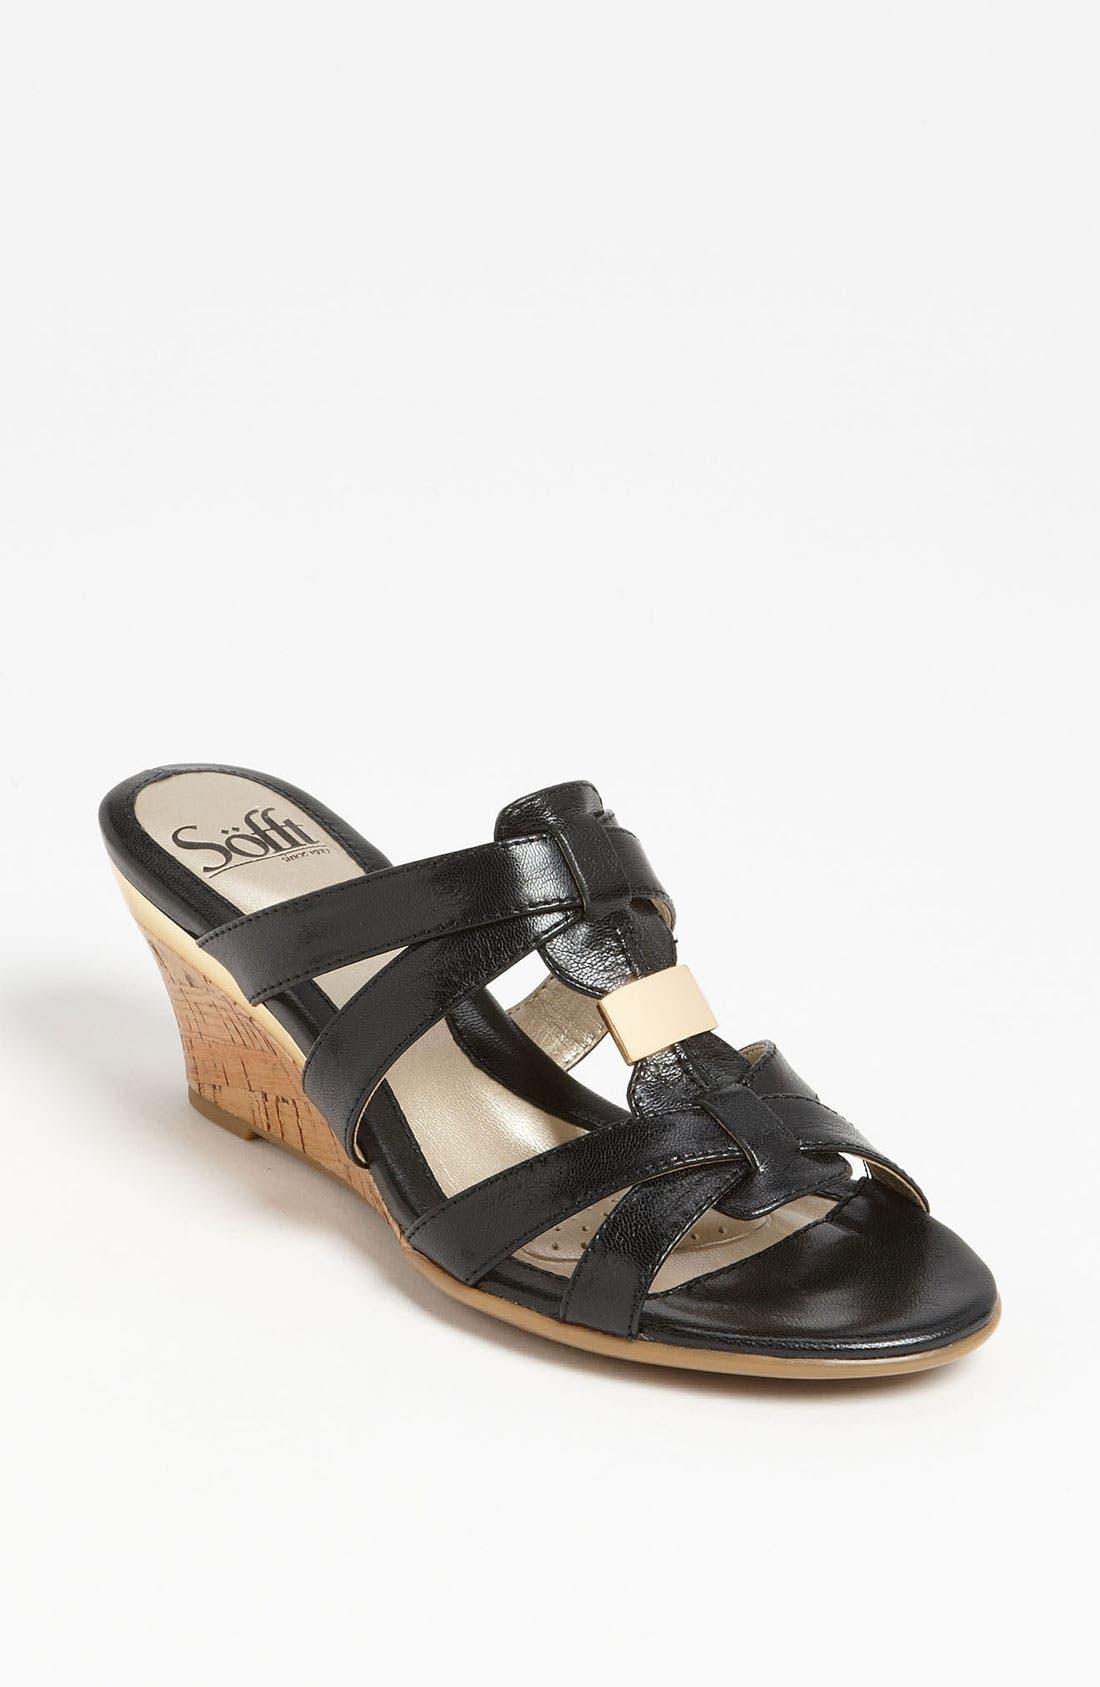 Alternate Image 1 Selected - Söfft 'Pestora' Sandal